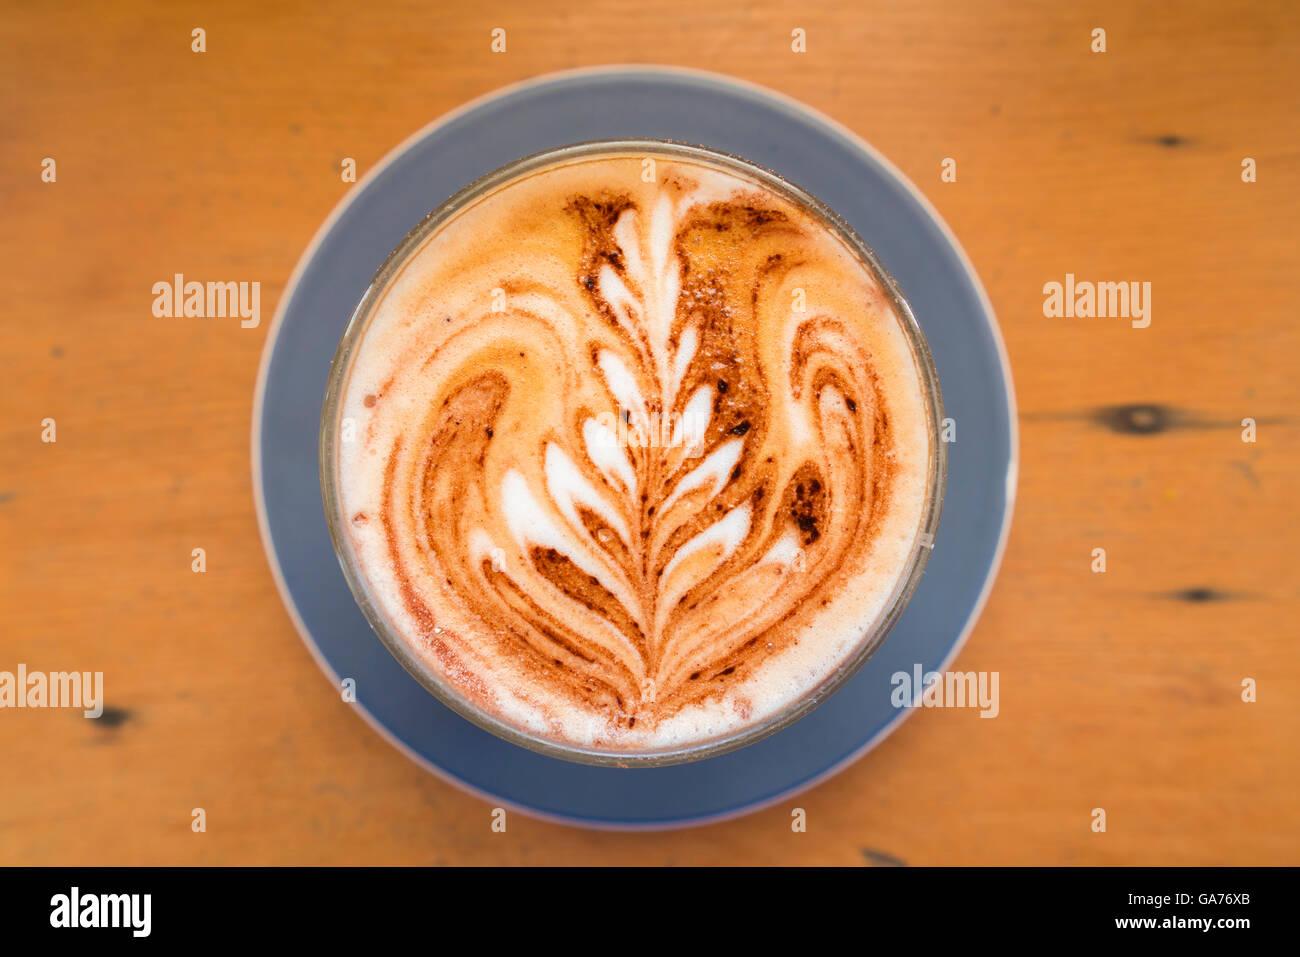 Coffee with latte art Stock Photo